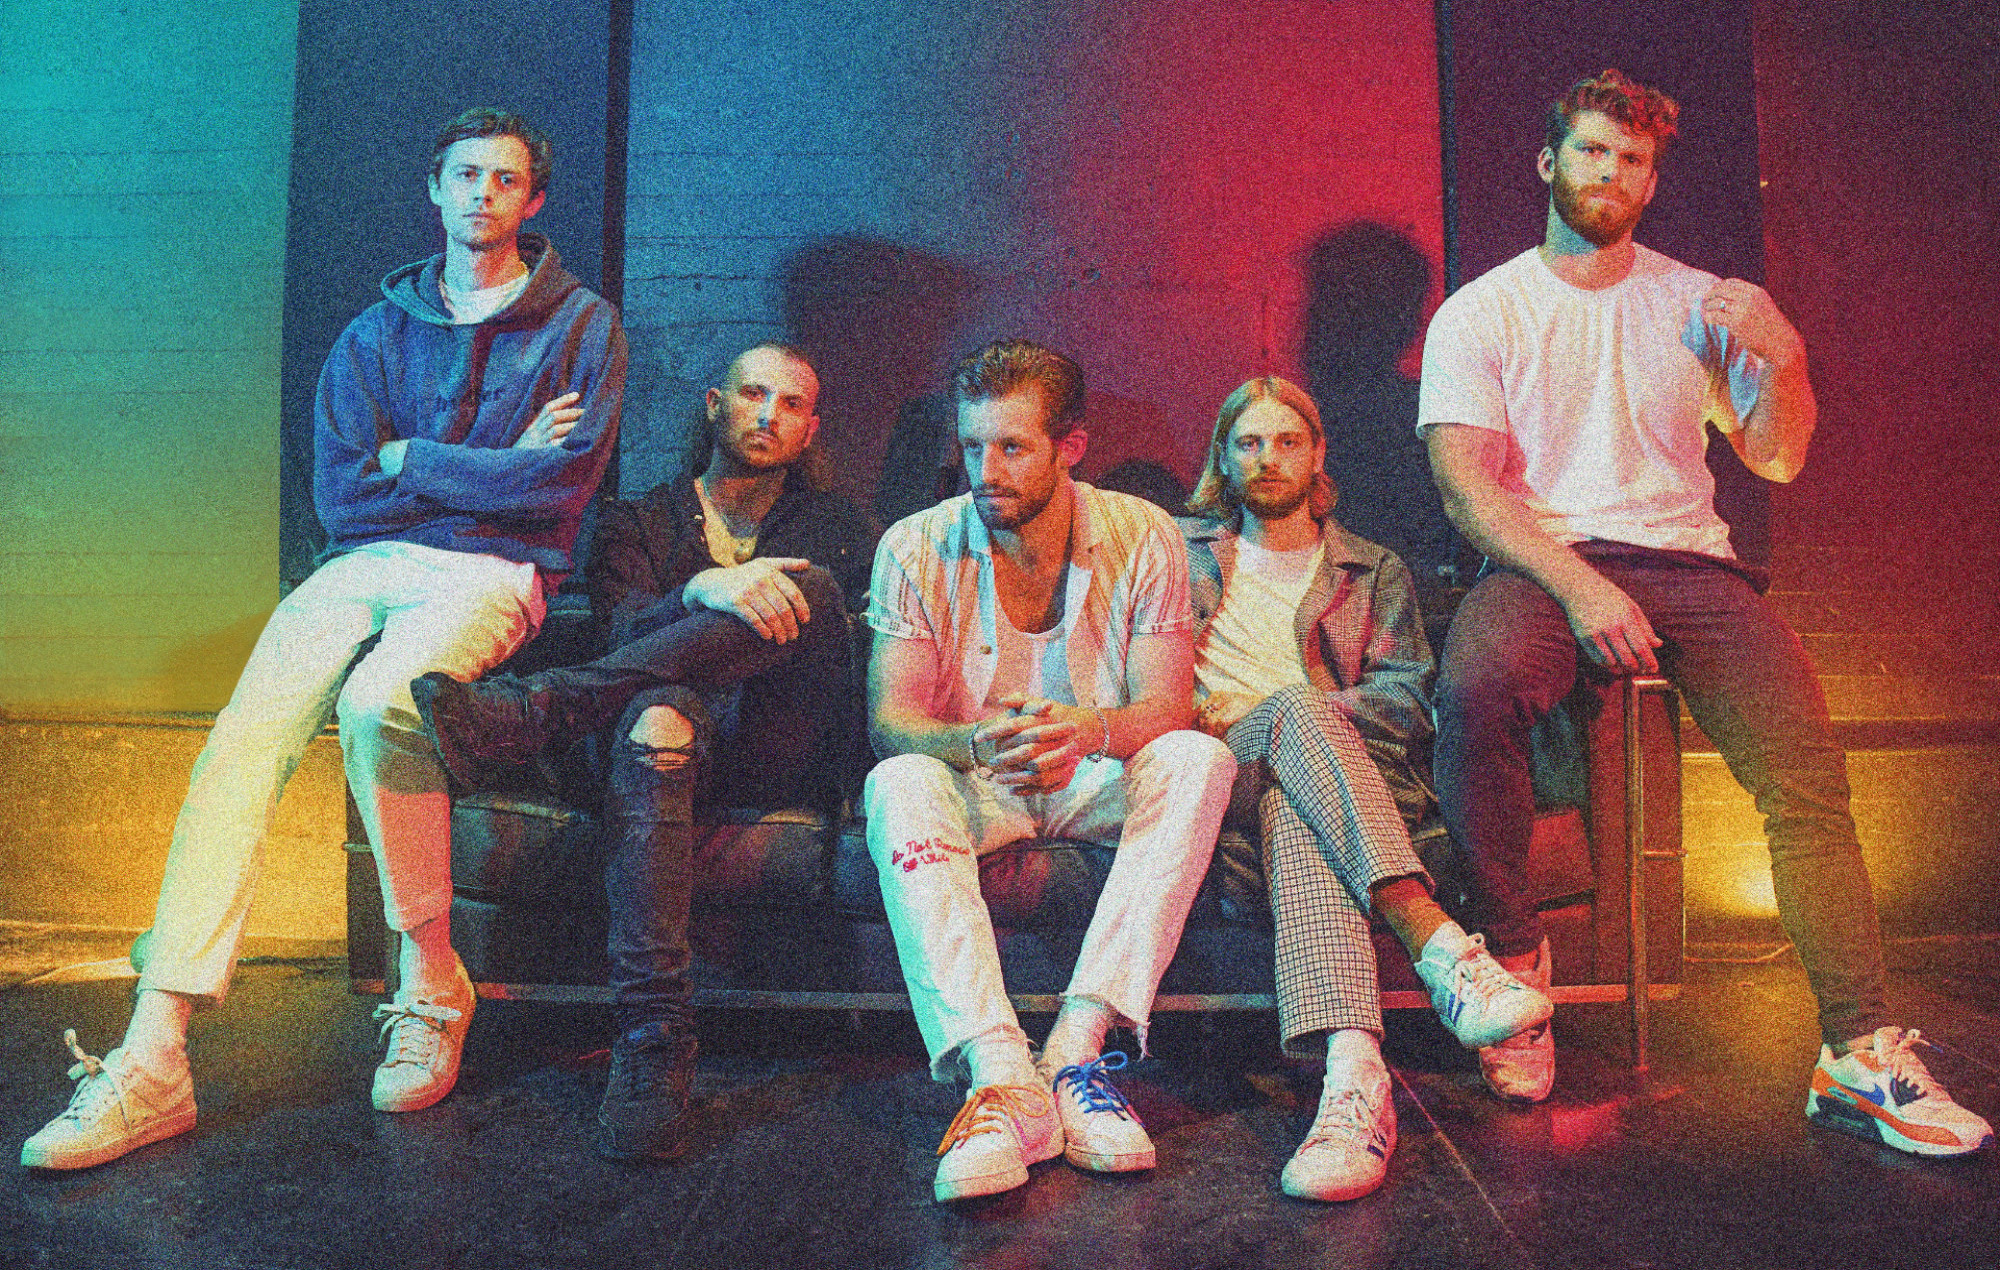 The Rubens release new single 'Heavy Weather'